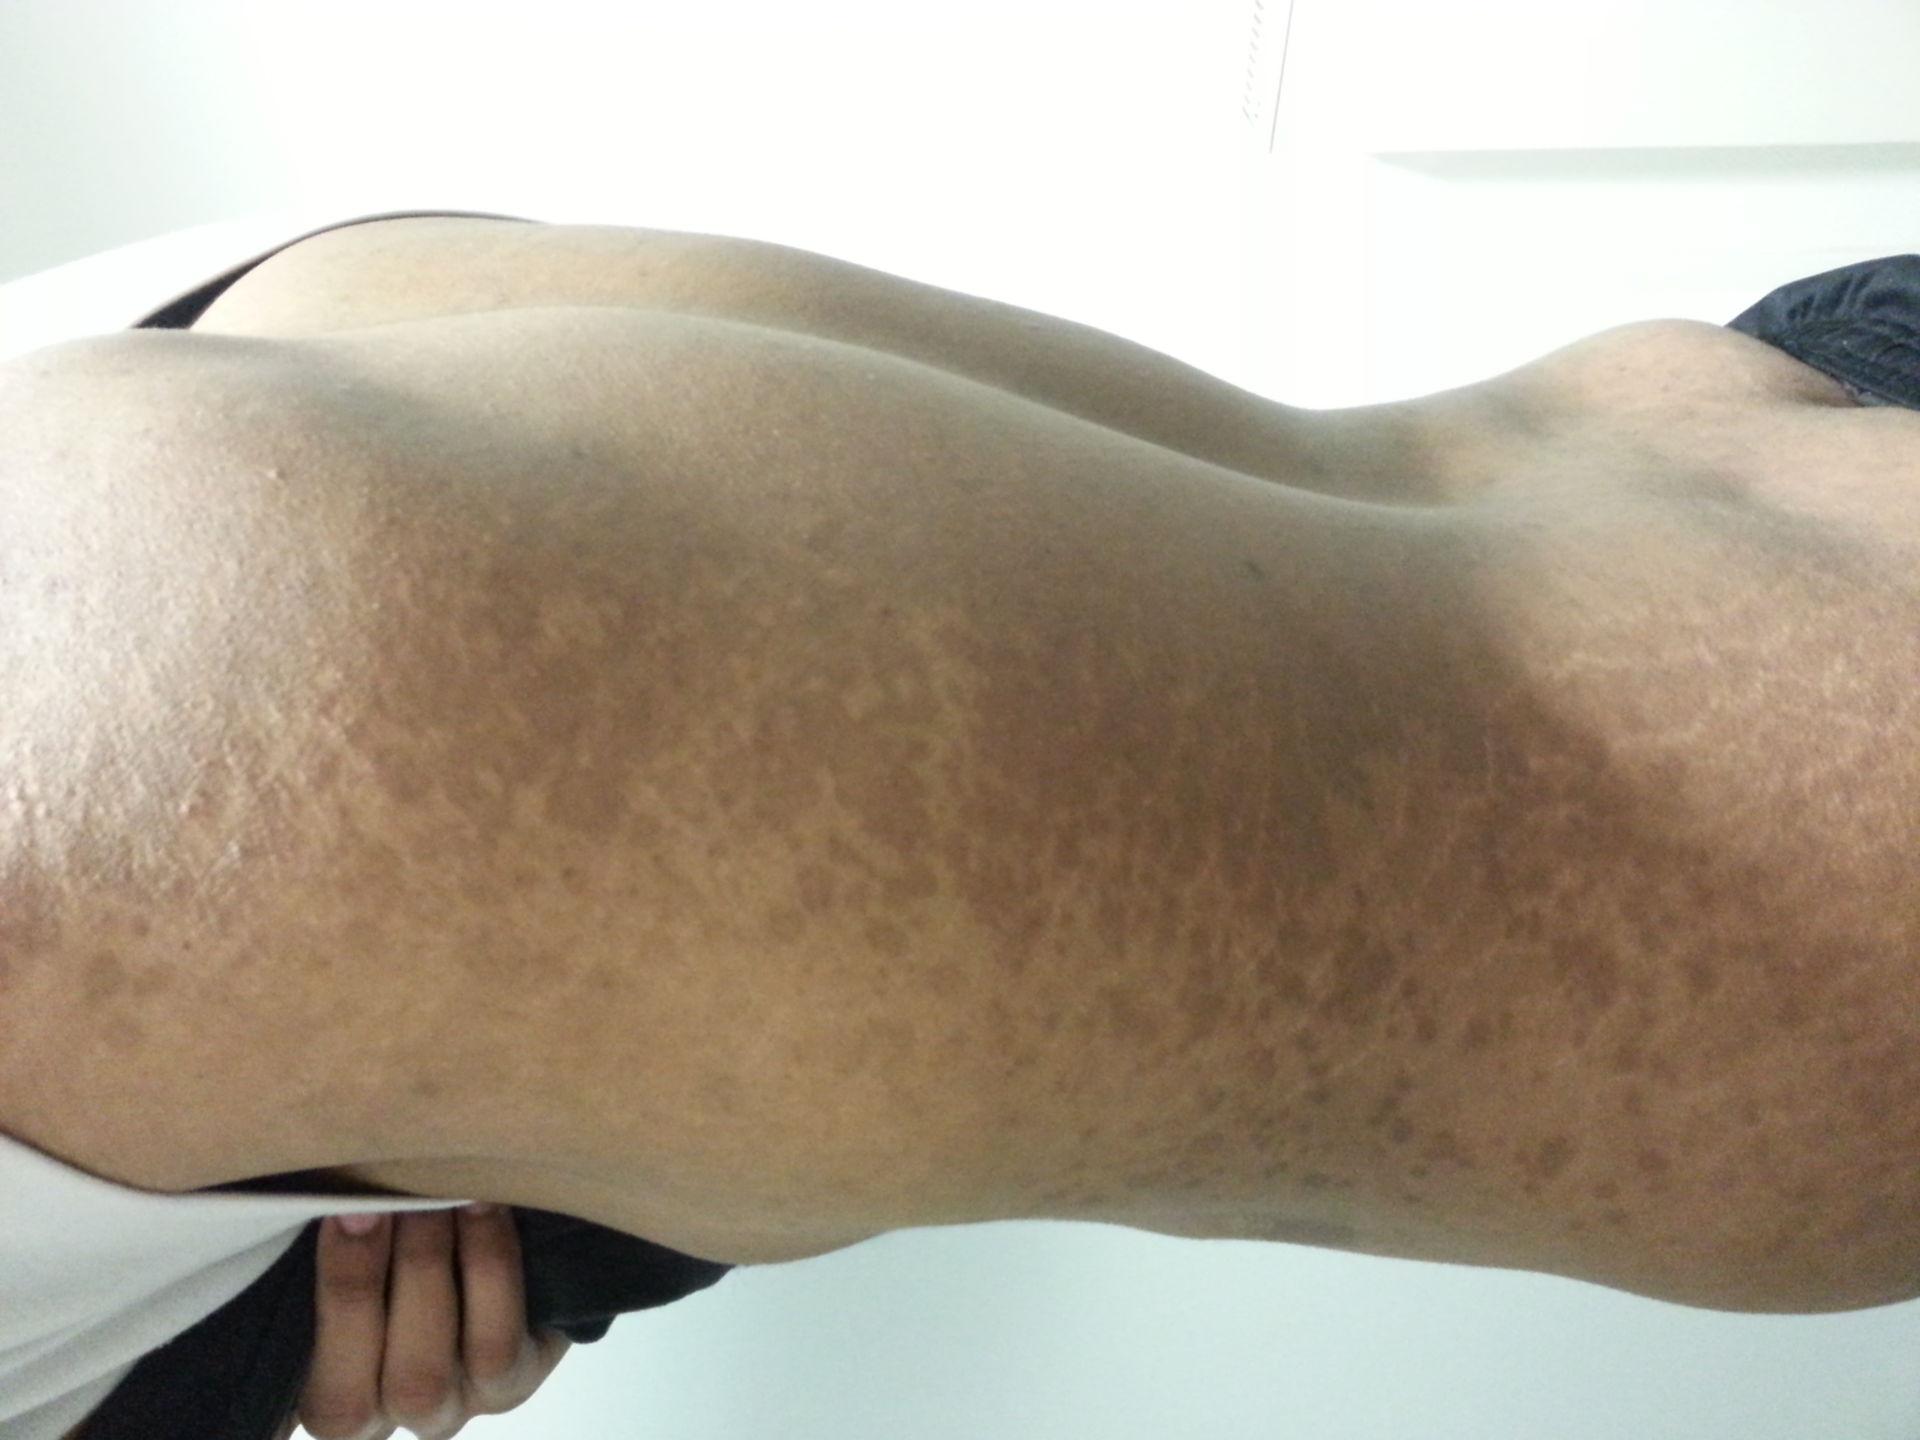 Unclear/unexplained skin disease